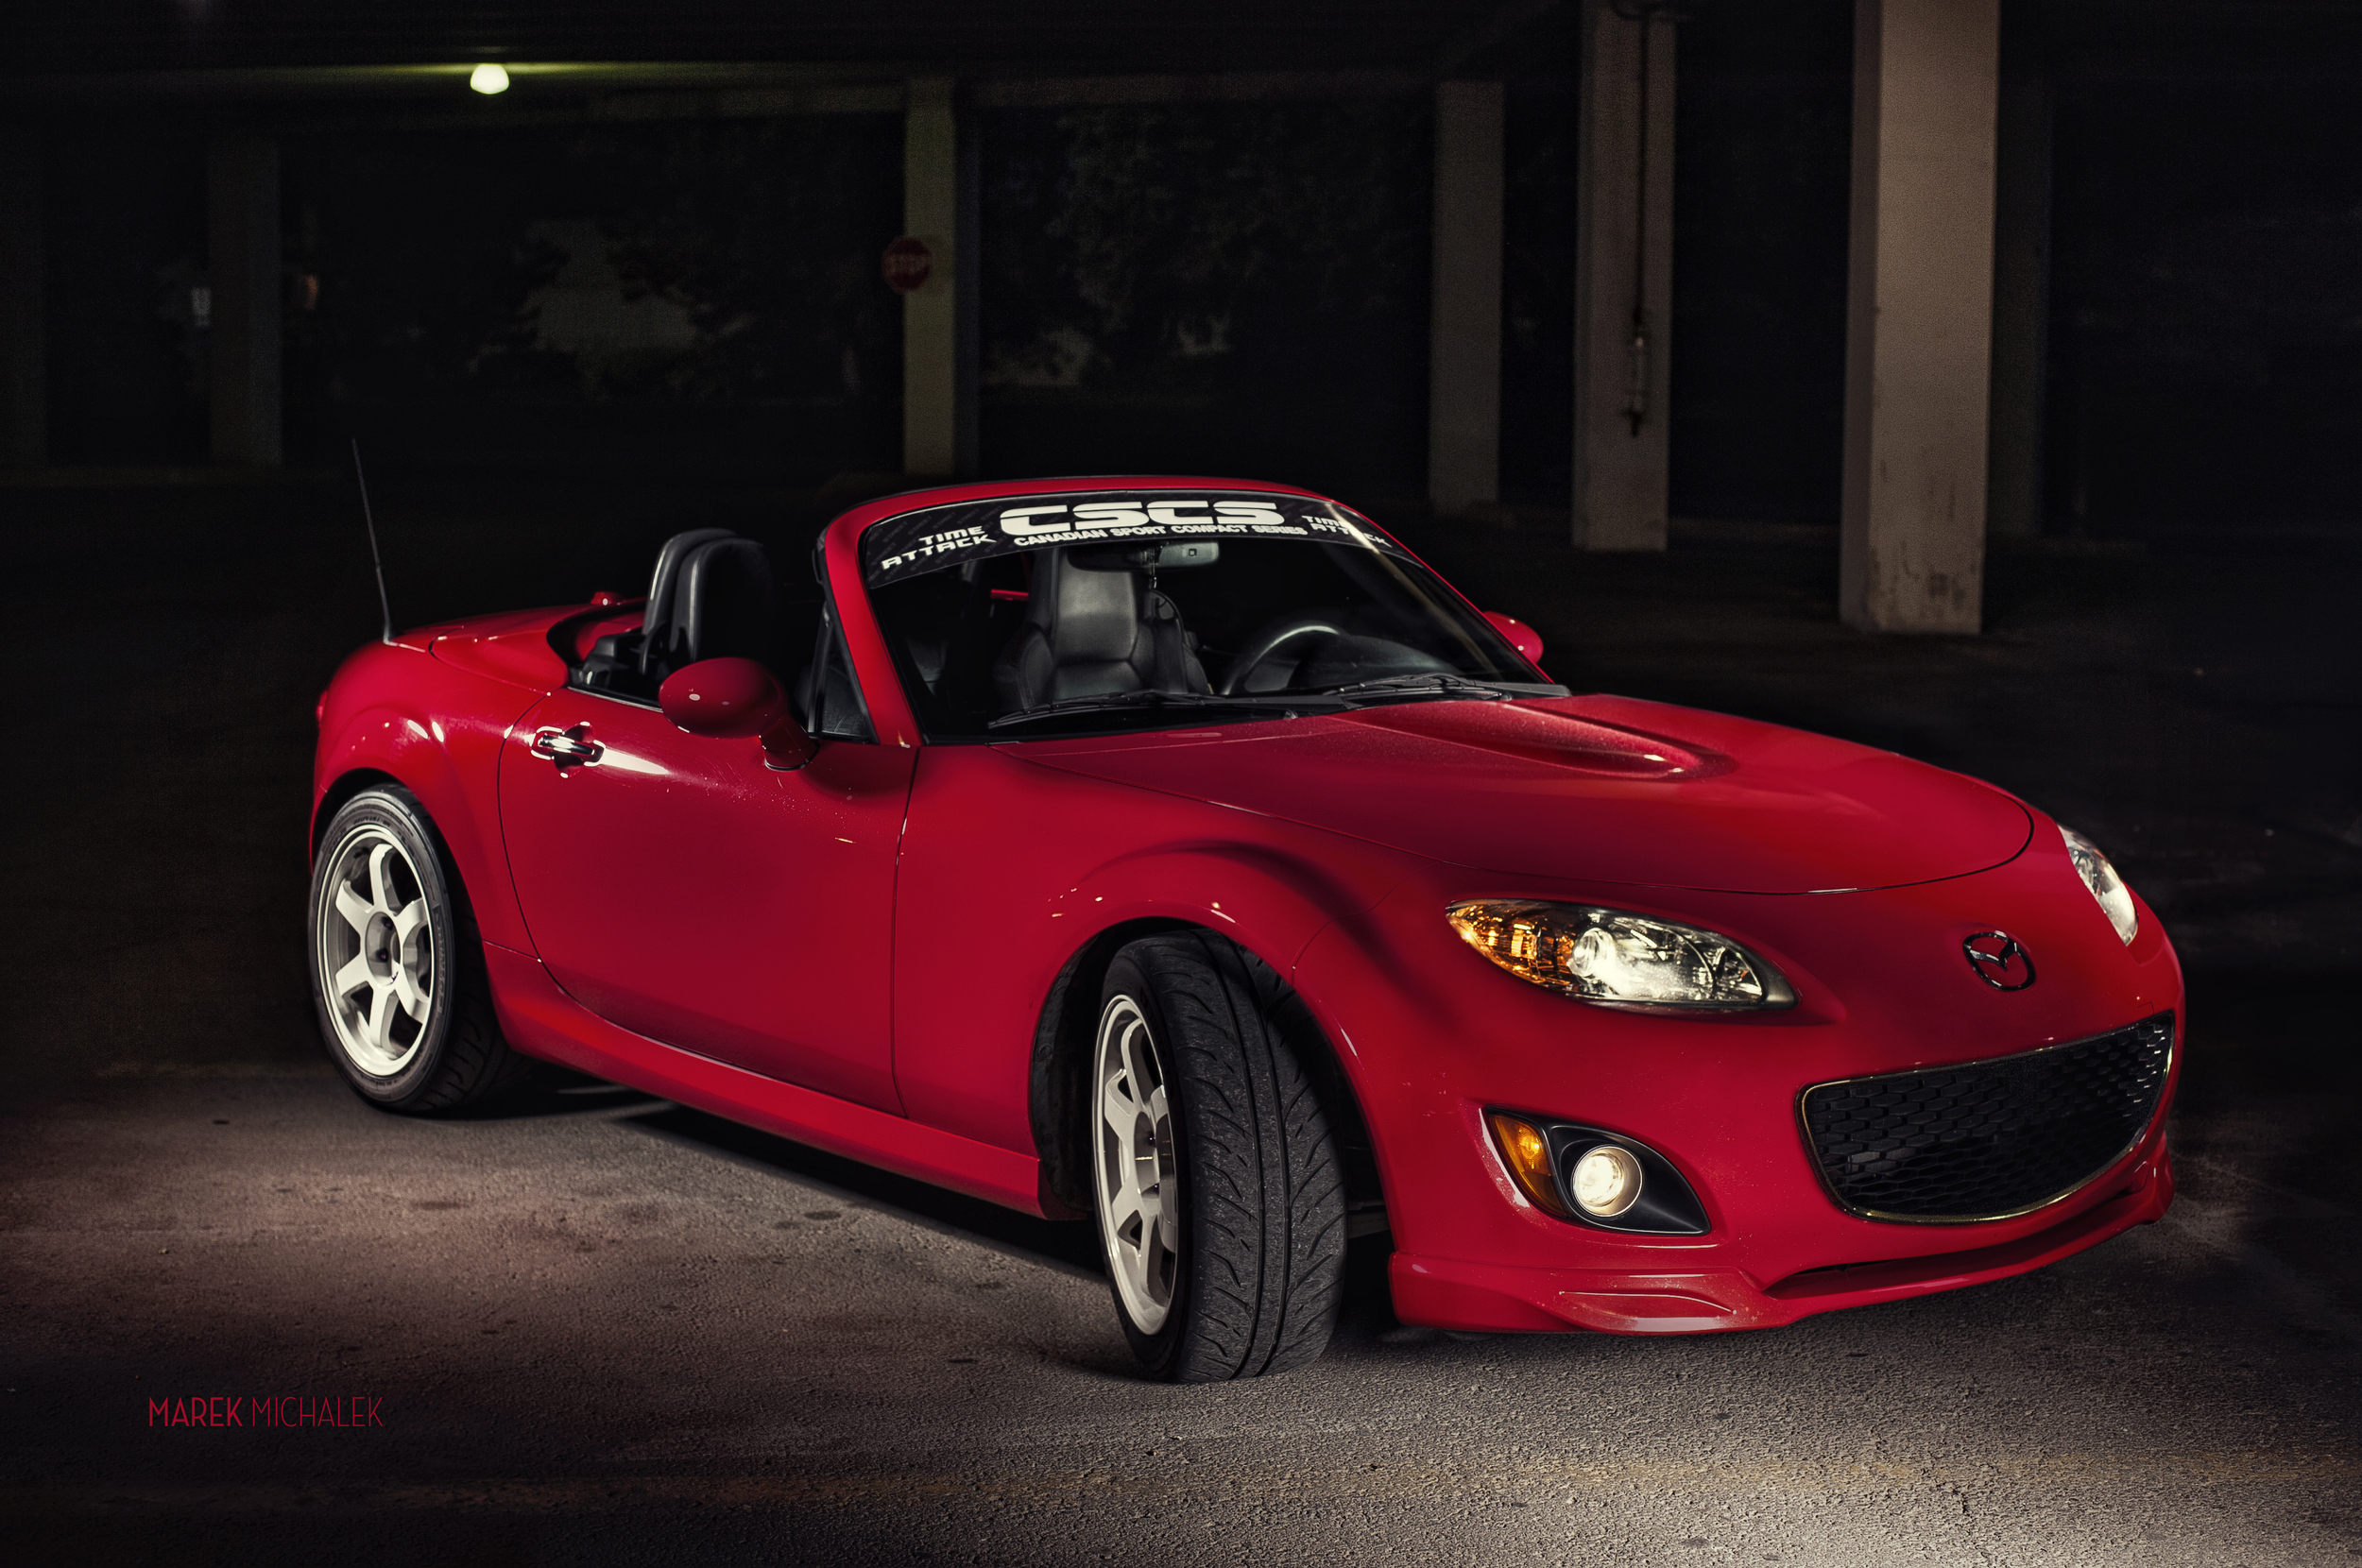 Toronto Hamilton Automotive Photographer - Marek Michalek - Mazda Miata 01.jpg